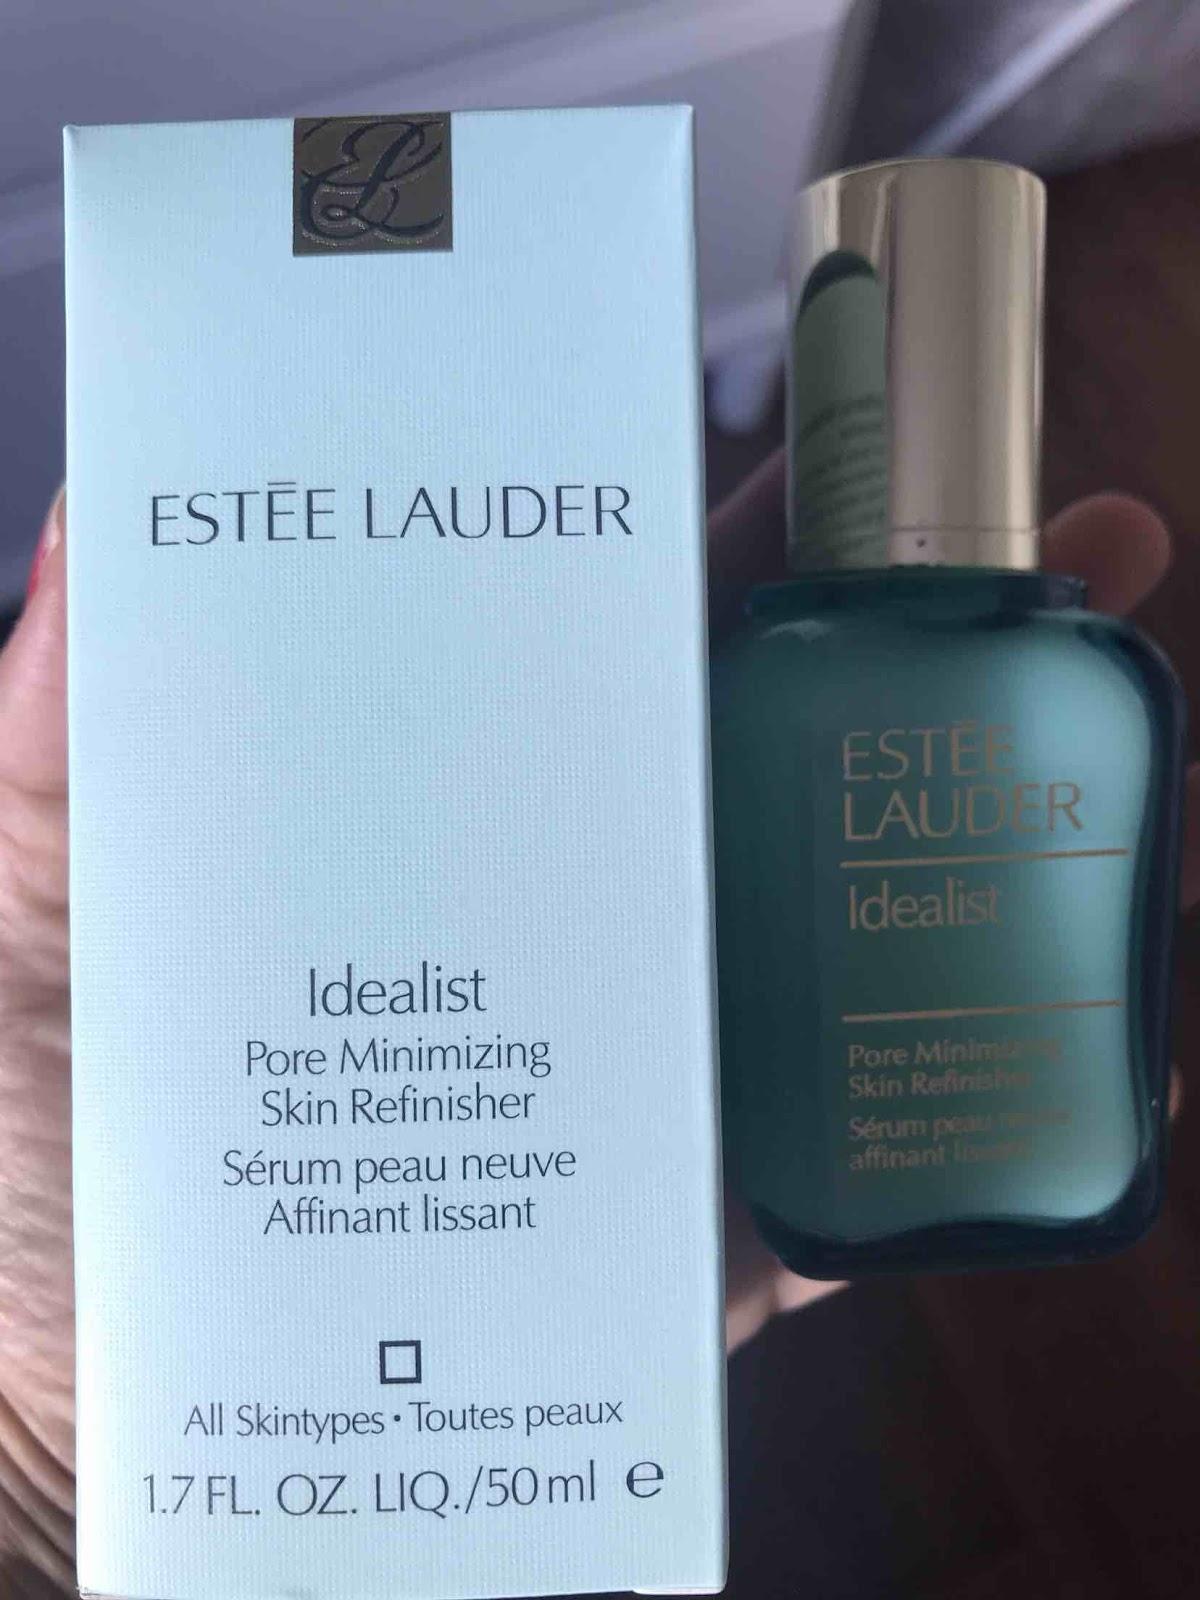 Estee Lauder Idealist Pore Minimizing Skin Refinisher 50ml 1 7 Oz